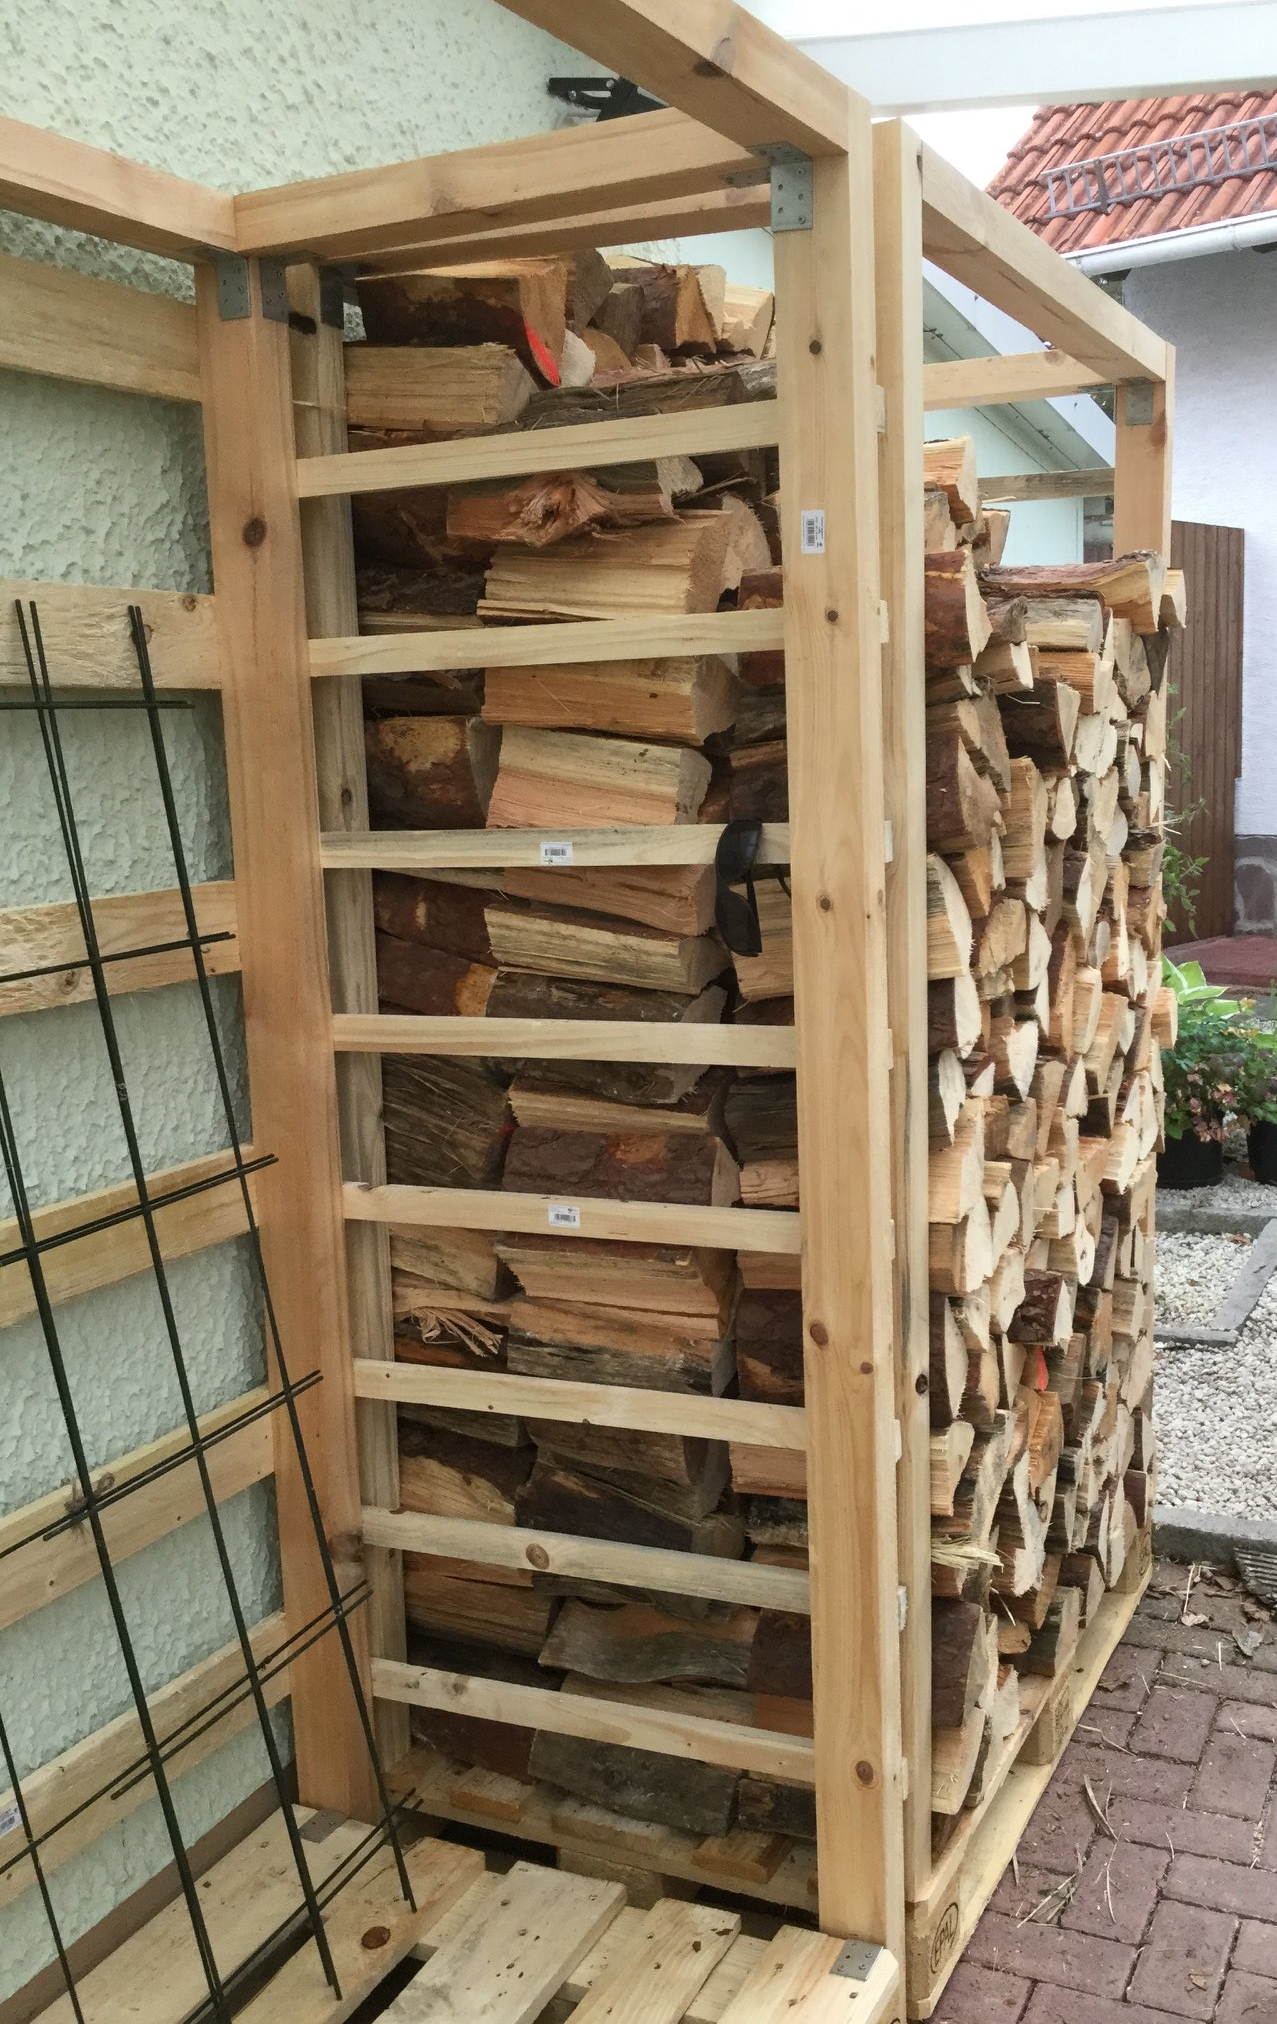 Bevorzugt Paletten Upcycling: Massiven Holzunterstand selbst bauen WY09